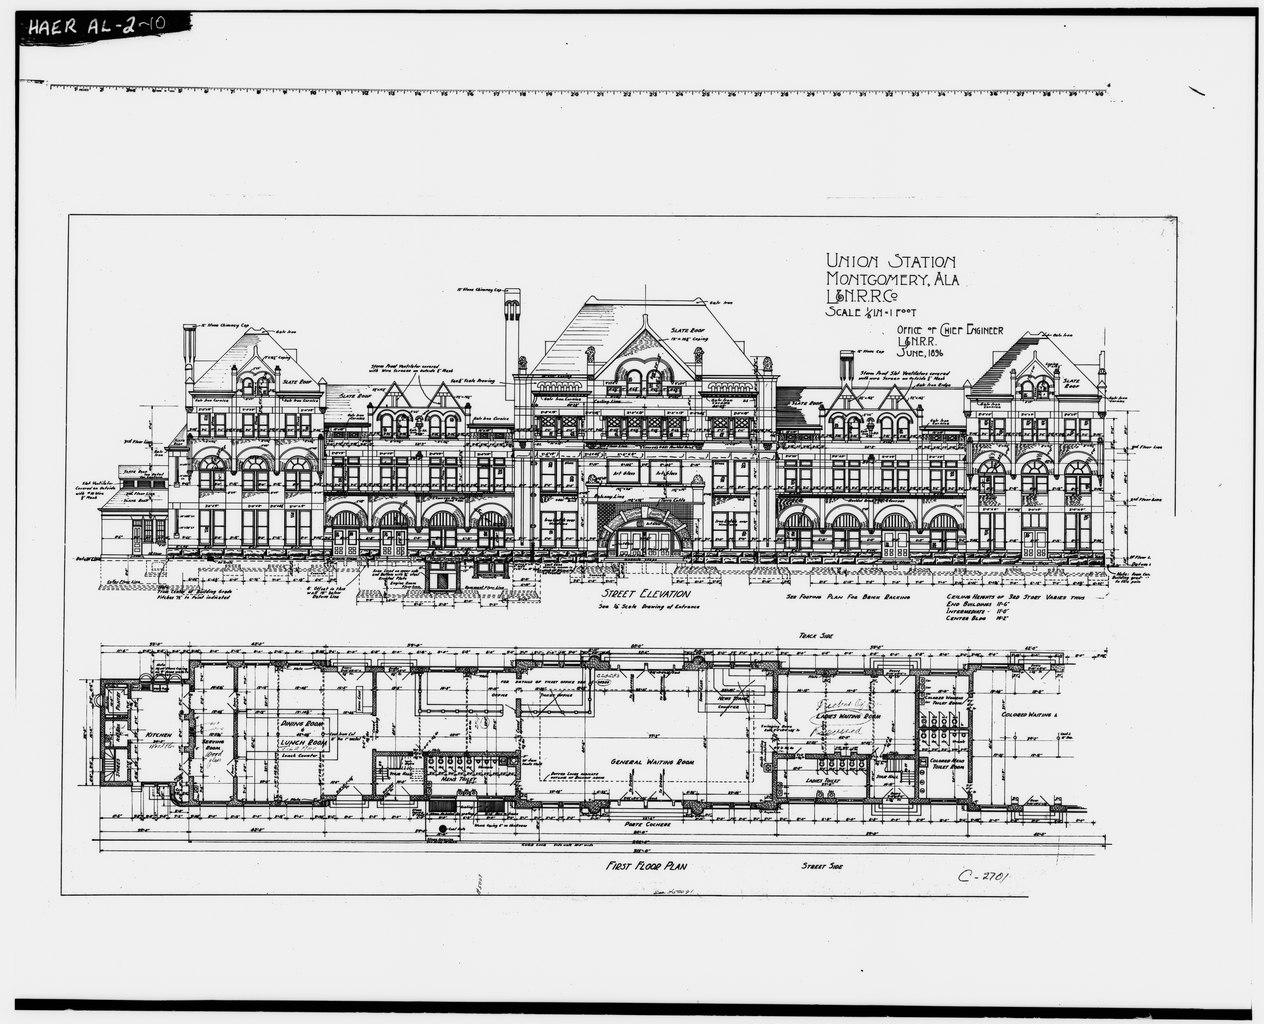 File:Photocopy of original Architect's Drawing (1896